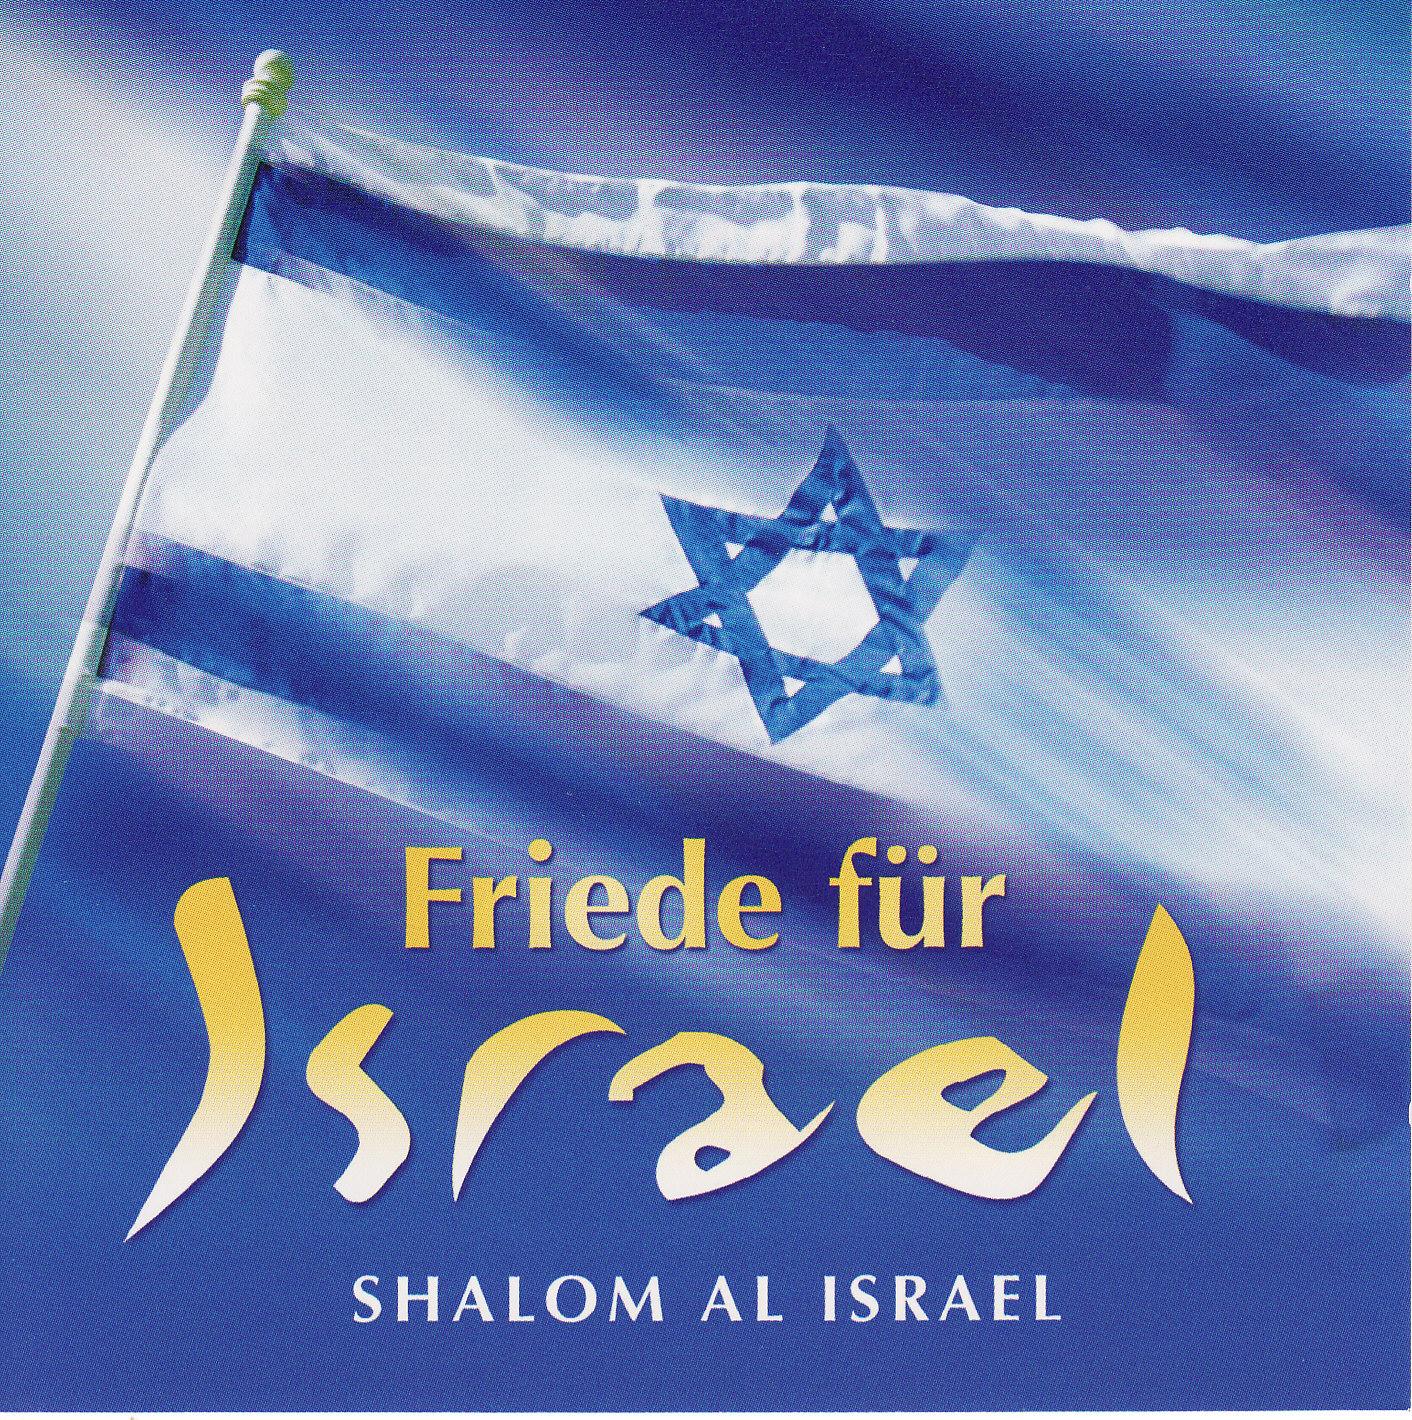 VA - Shalom Al Israel 2006